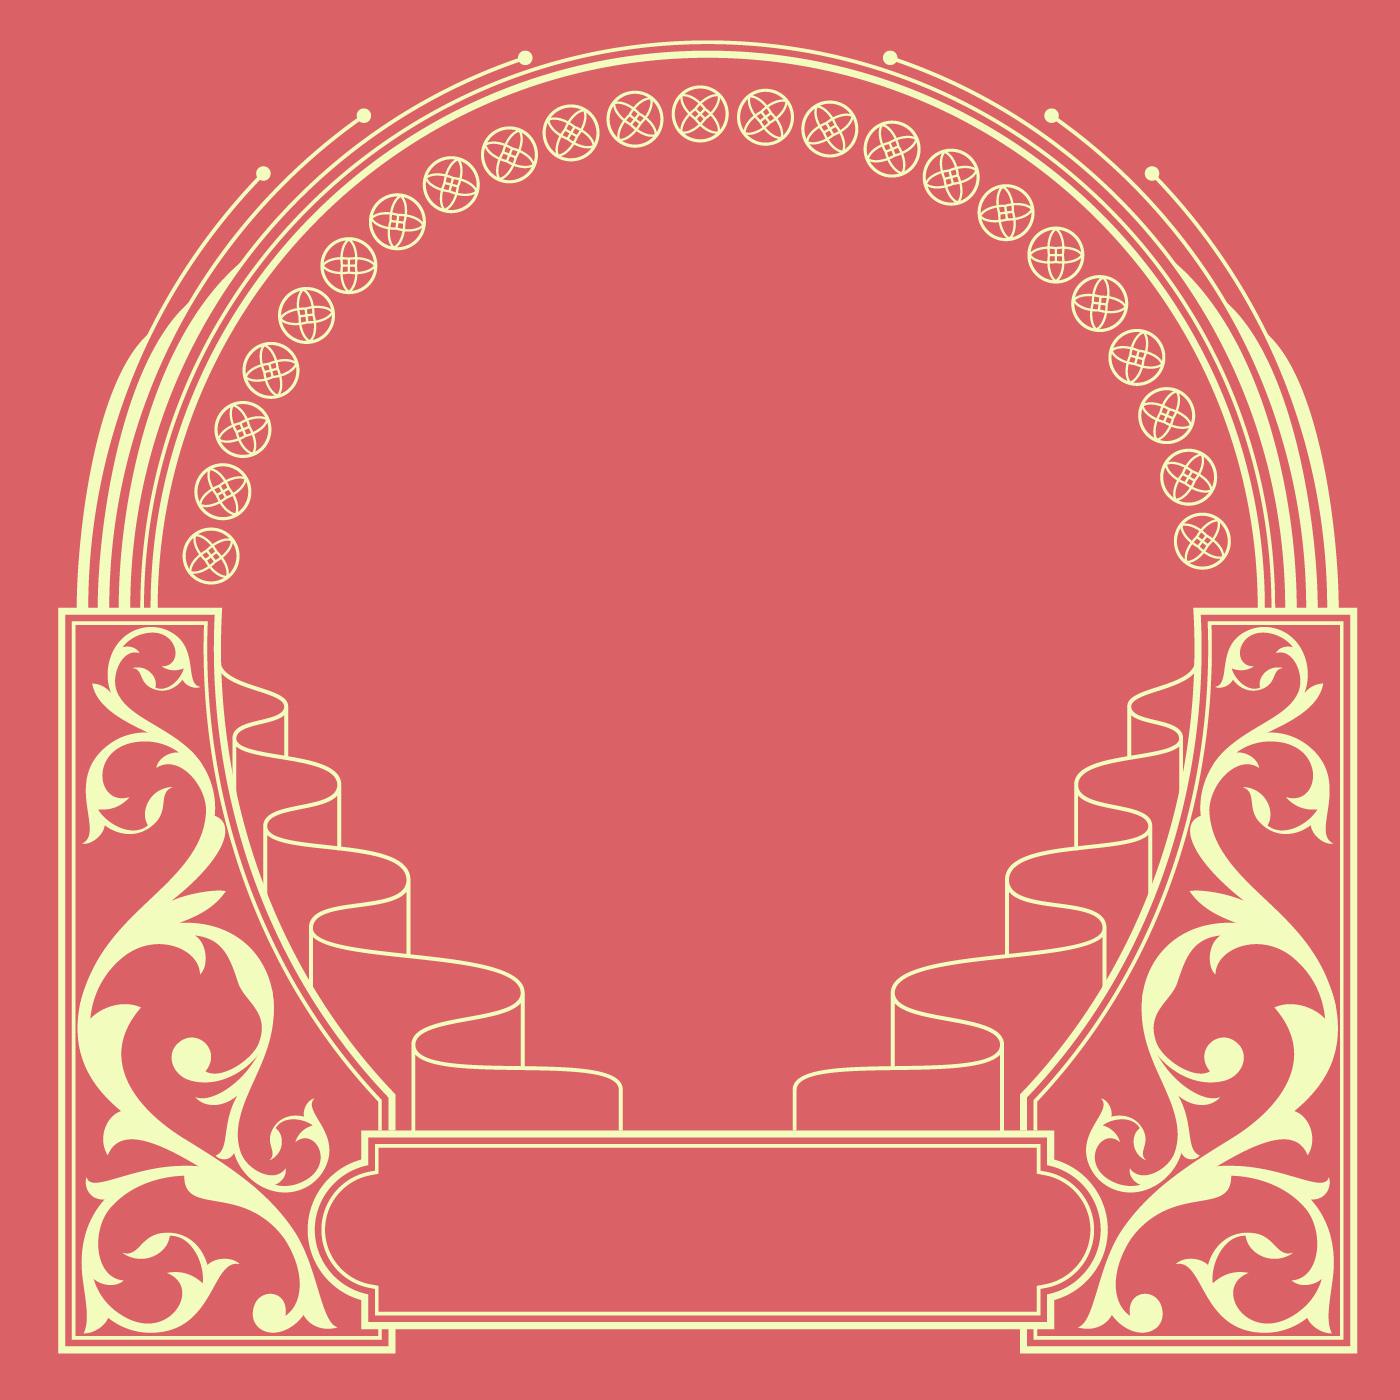 Ornamental Art Nouveau Frame Vector - Download Free Vector Art ...